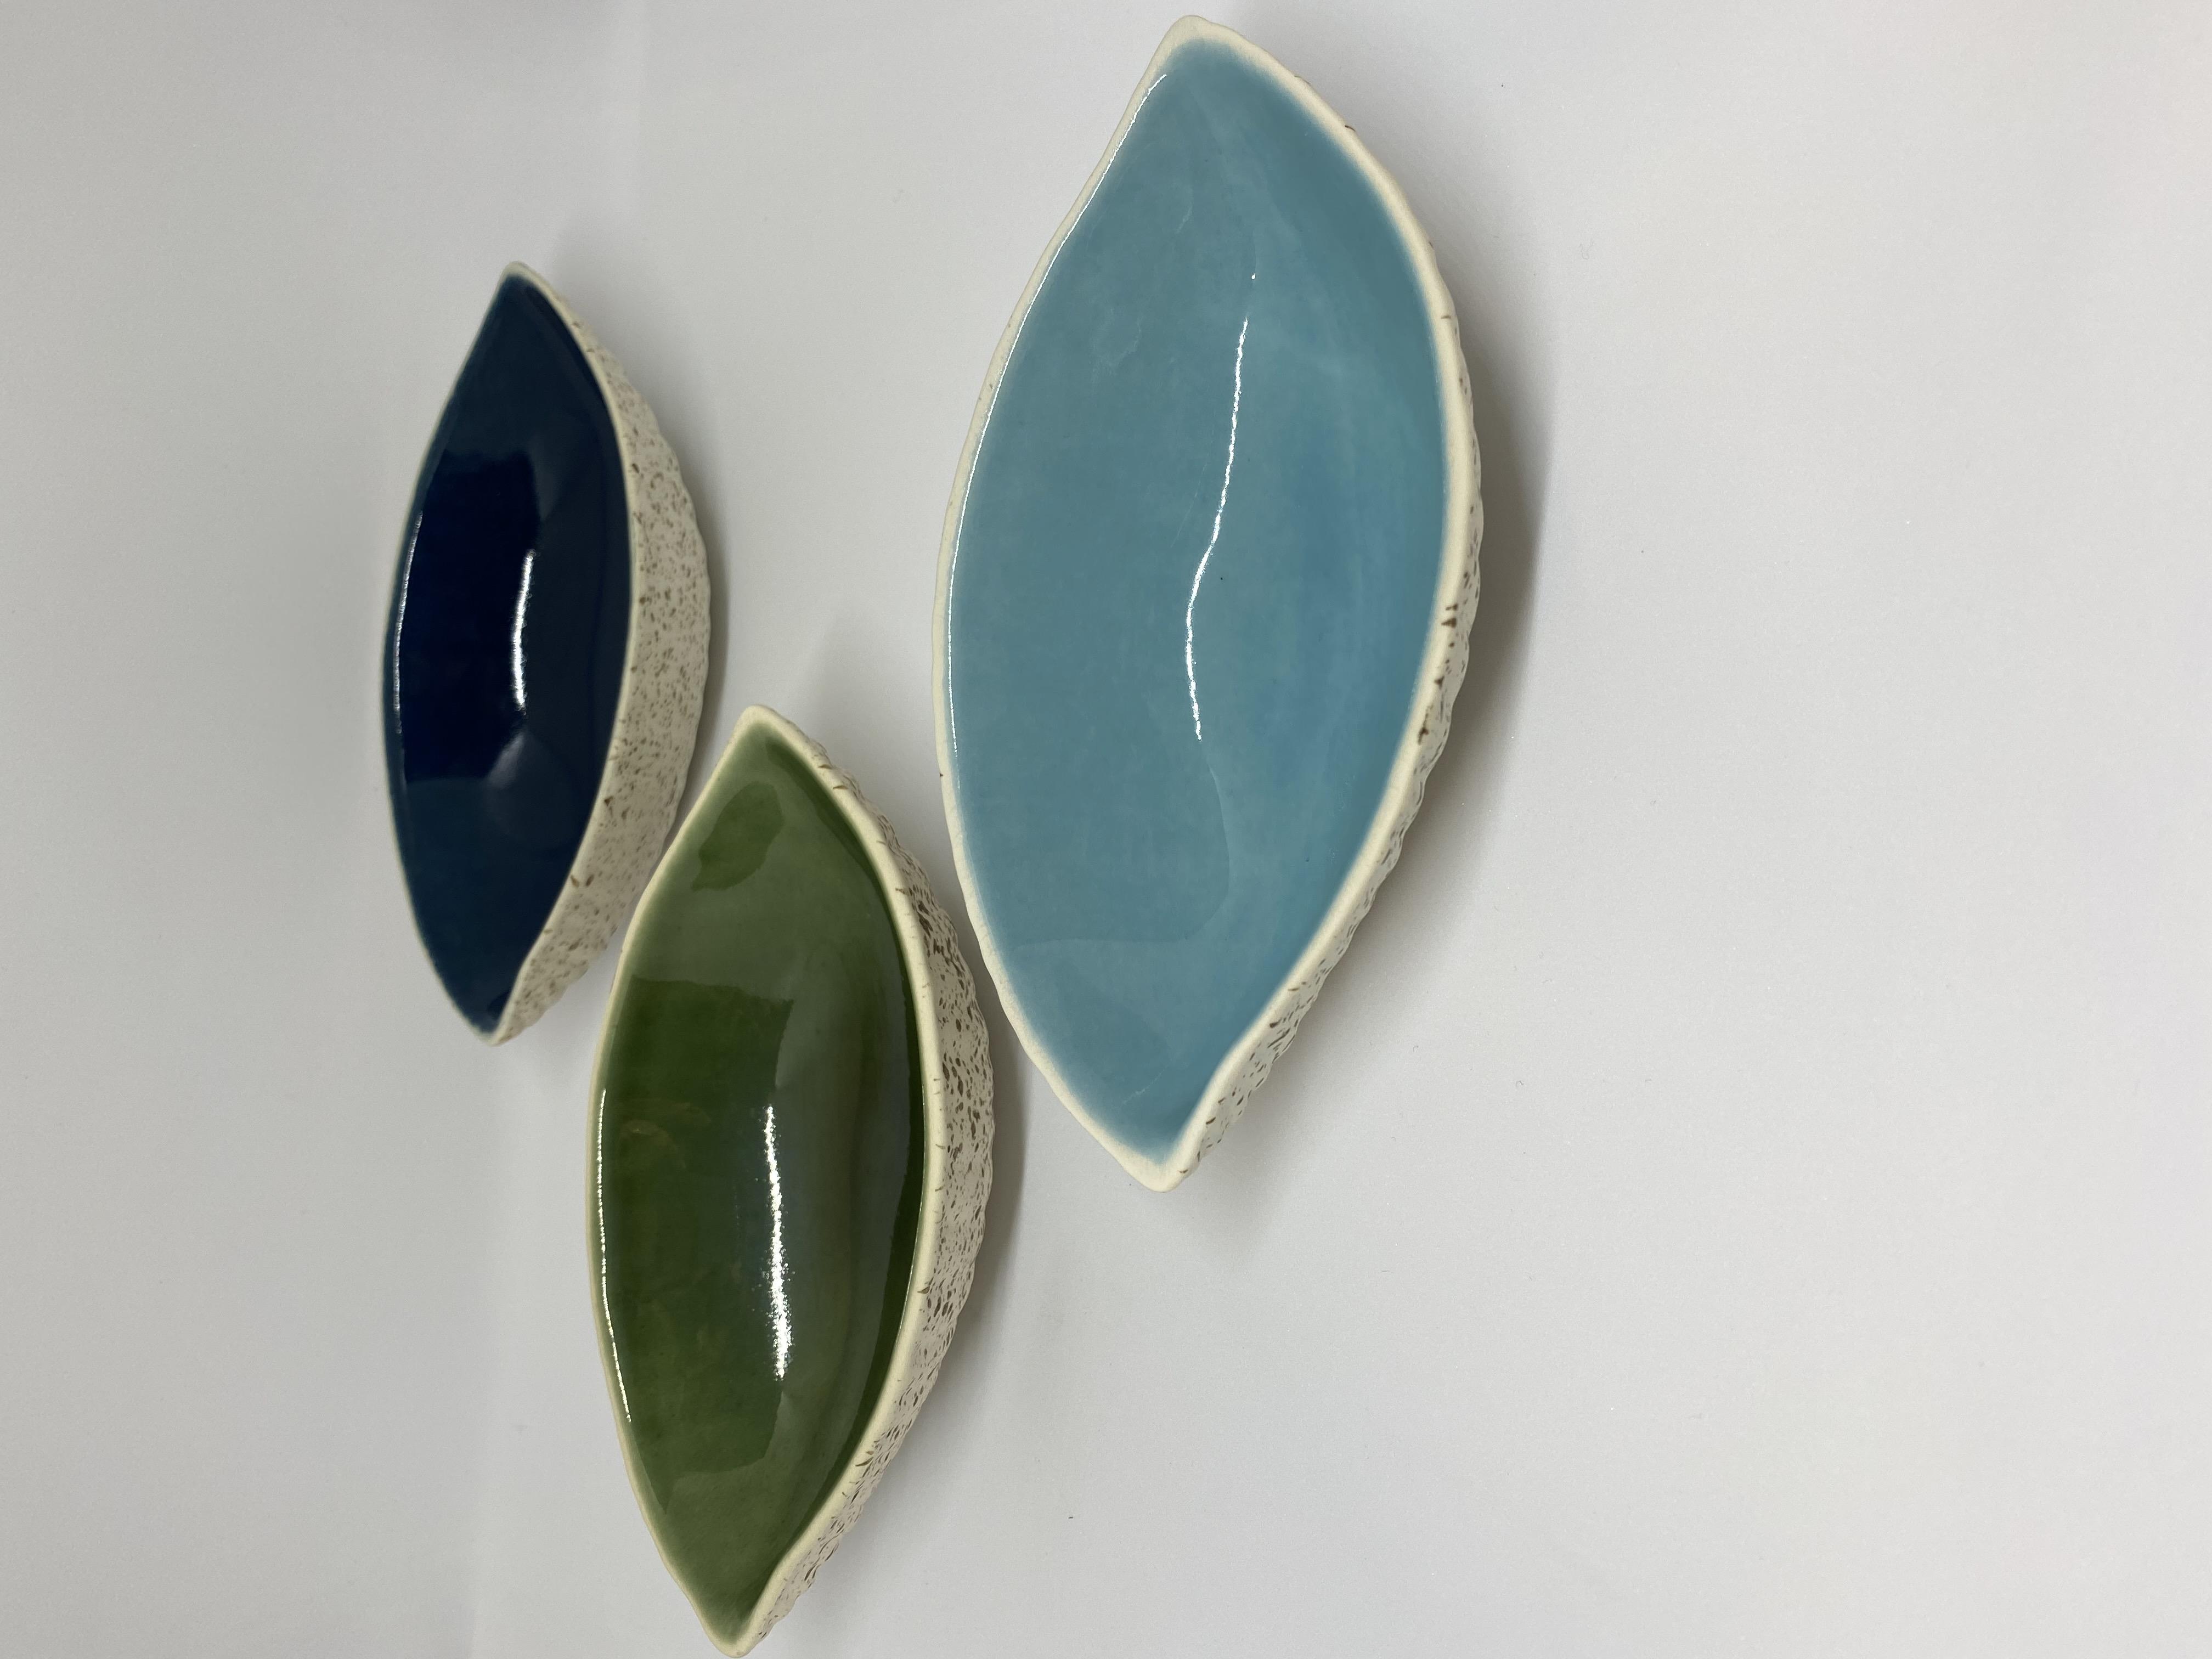 Royce McGlashen Small Pod Bowls